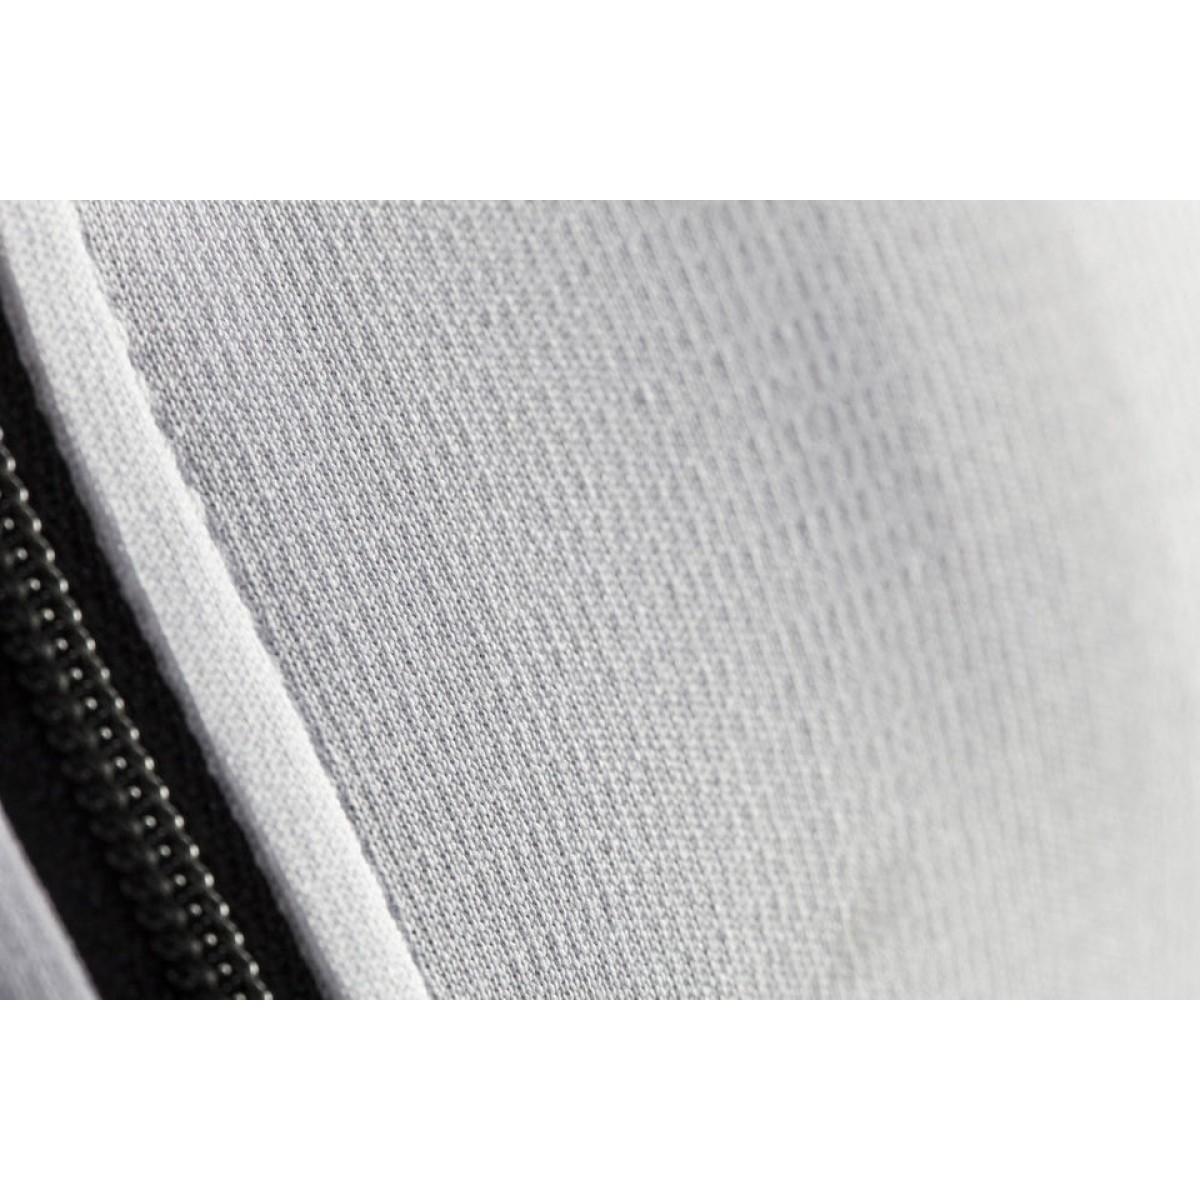 2900 - White